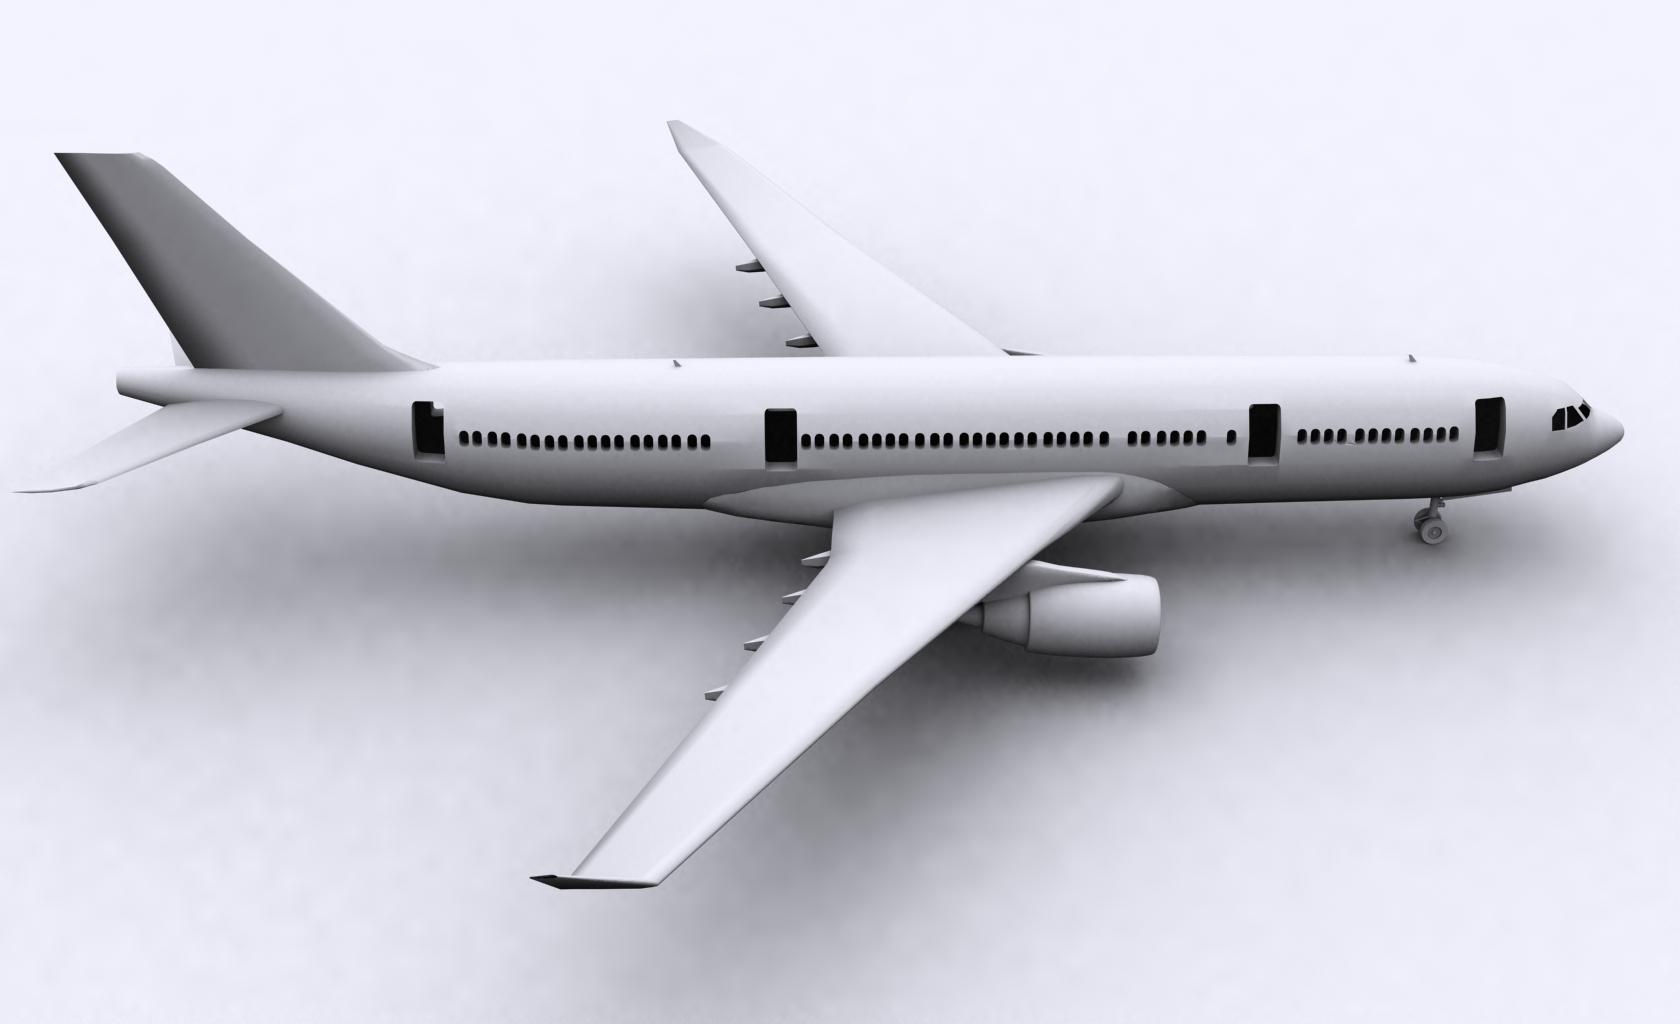 airbus a330-200 3d model ige igs iges  obj 152720